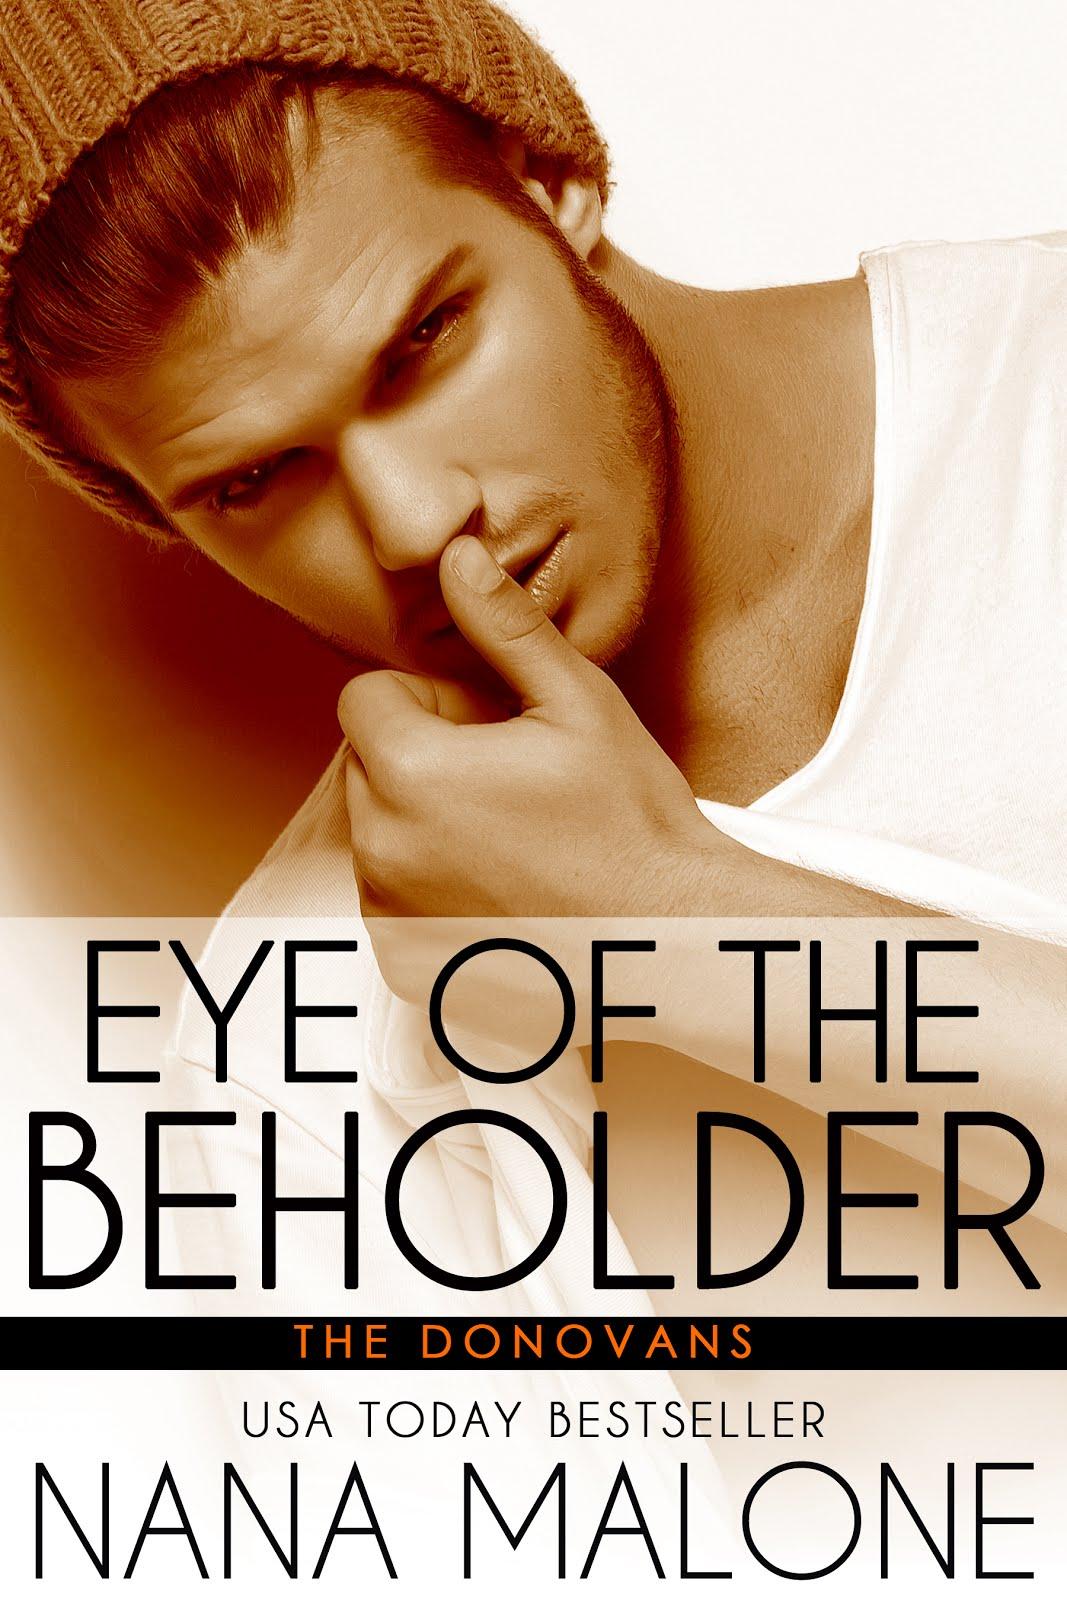 Eye of the Beholder by Nana Malone